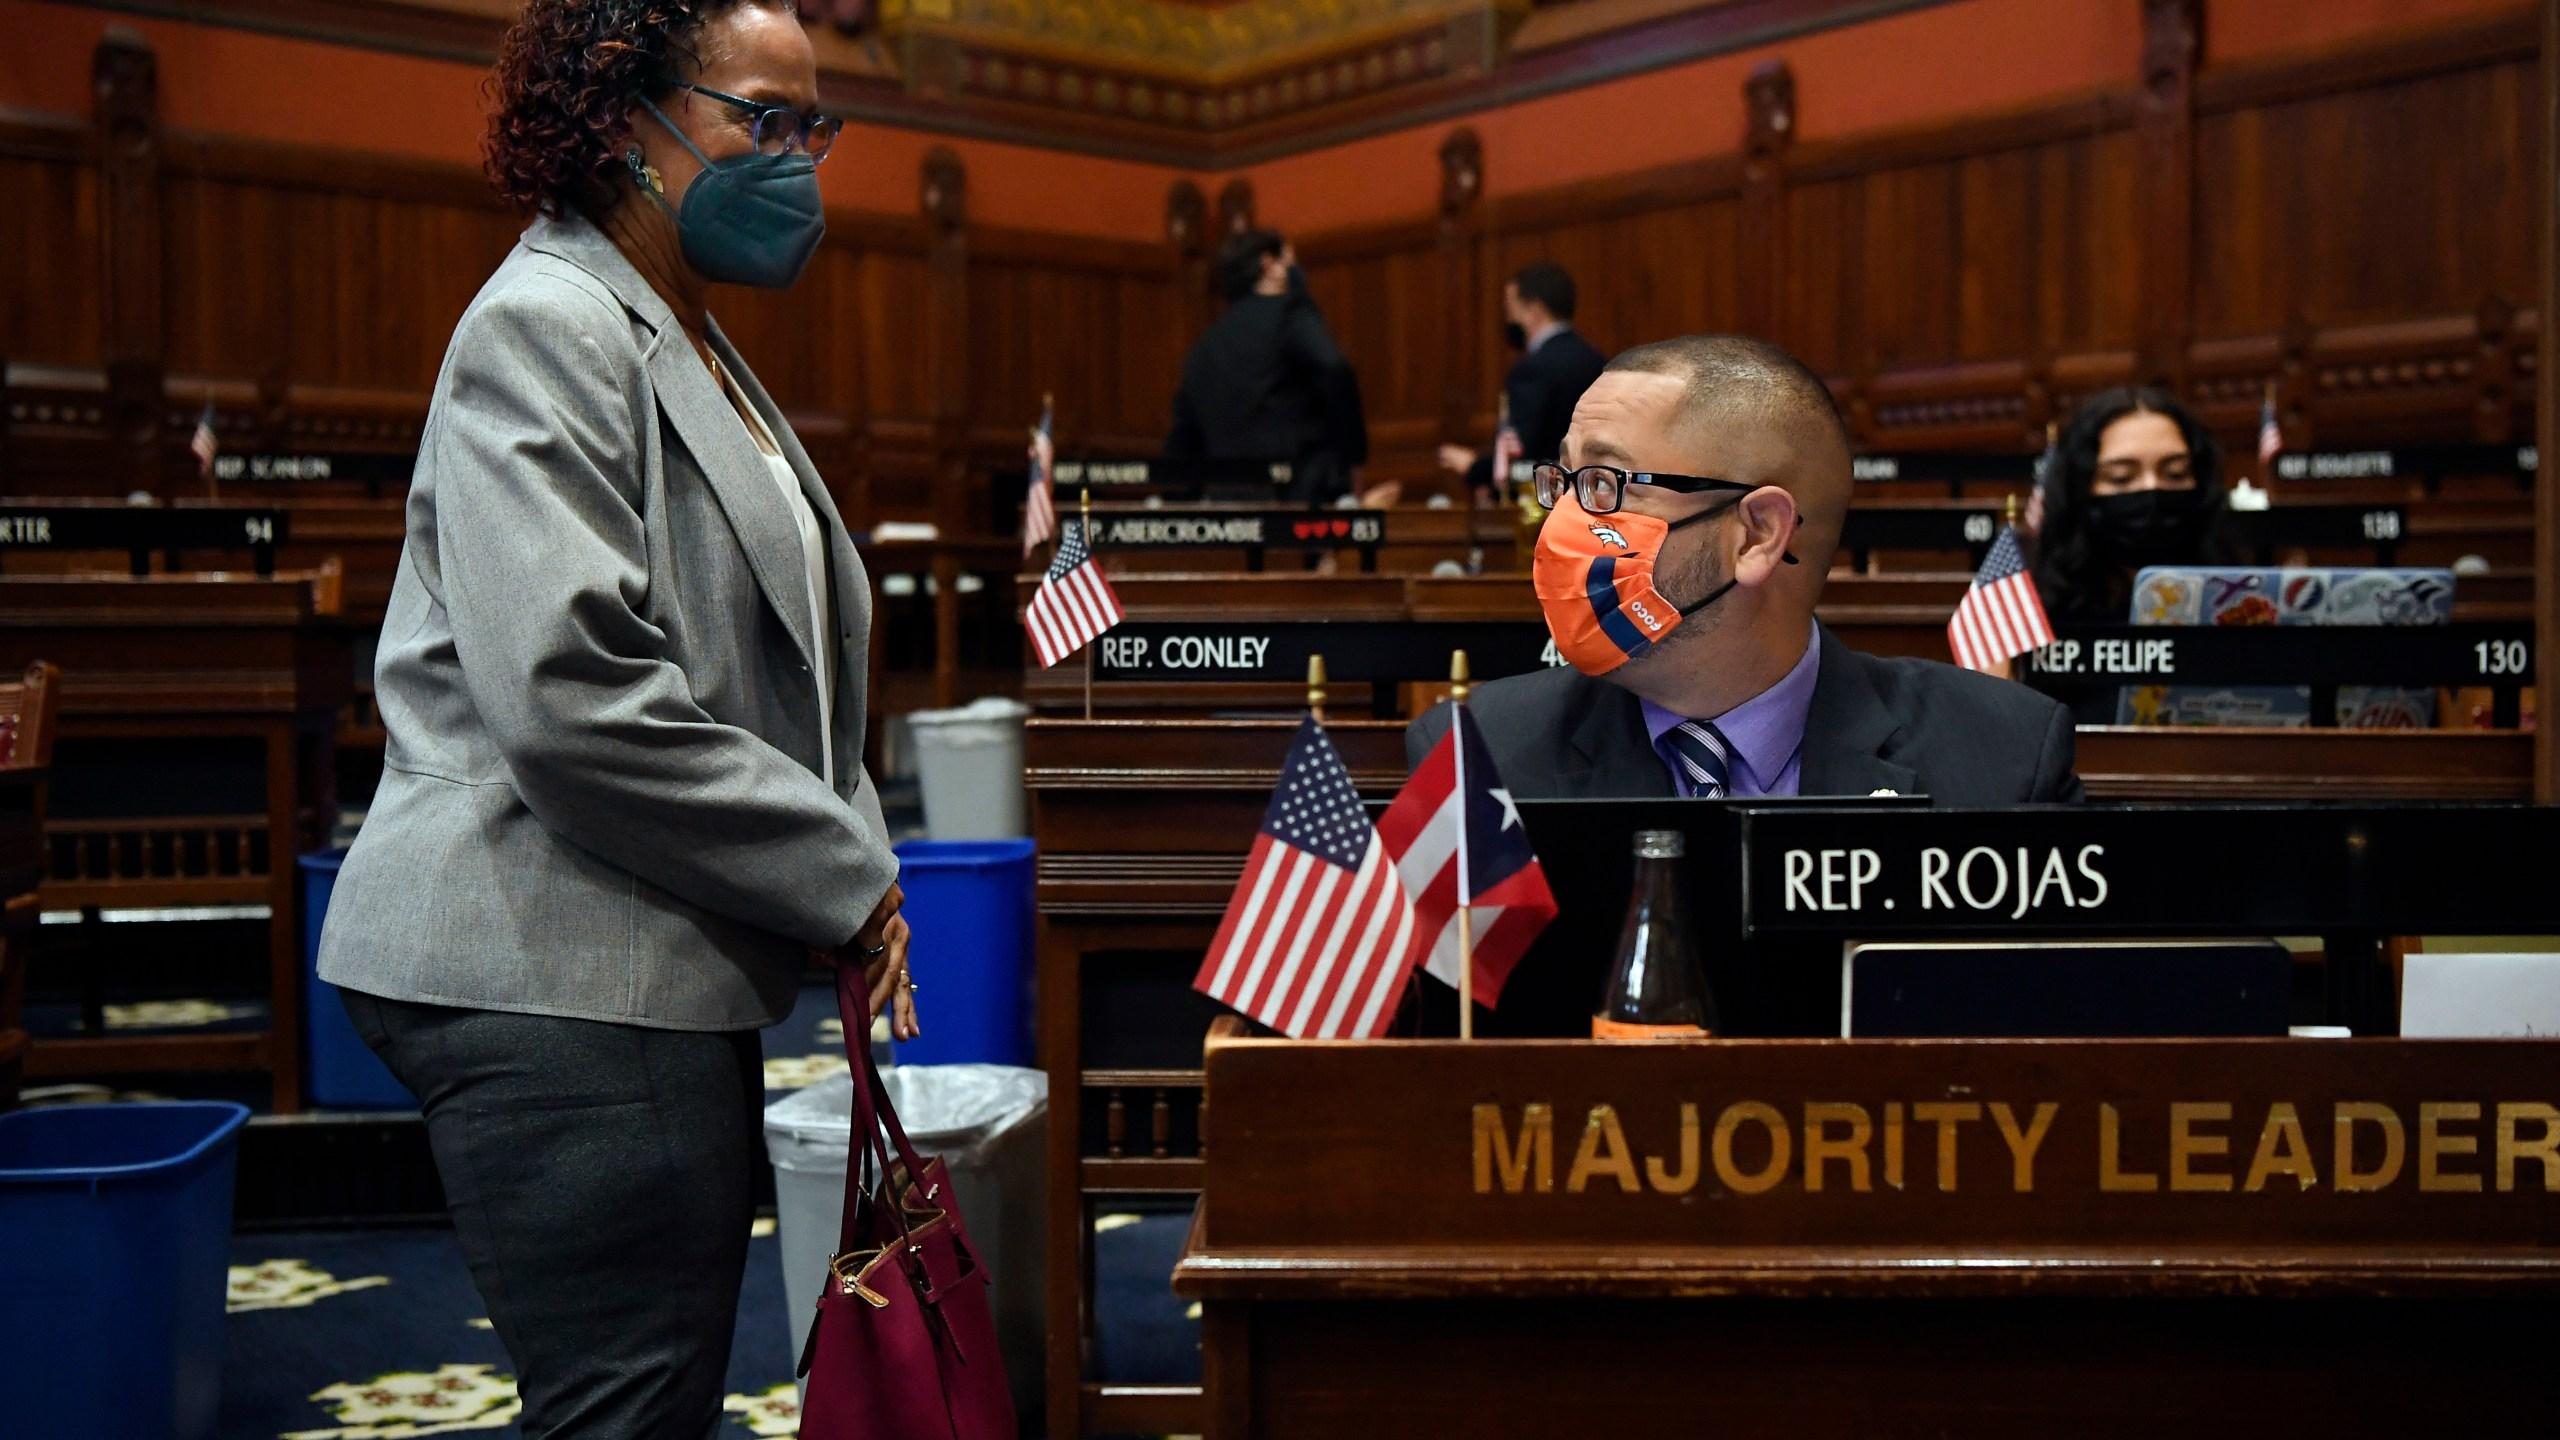 U S Minority Legislators Work To Pass Legislation Regarding Racial Equality Ktla